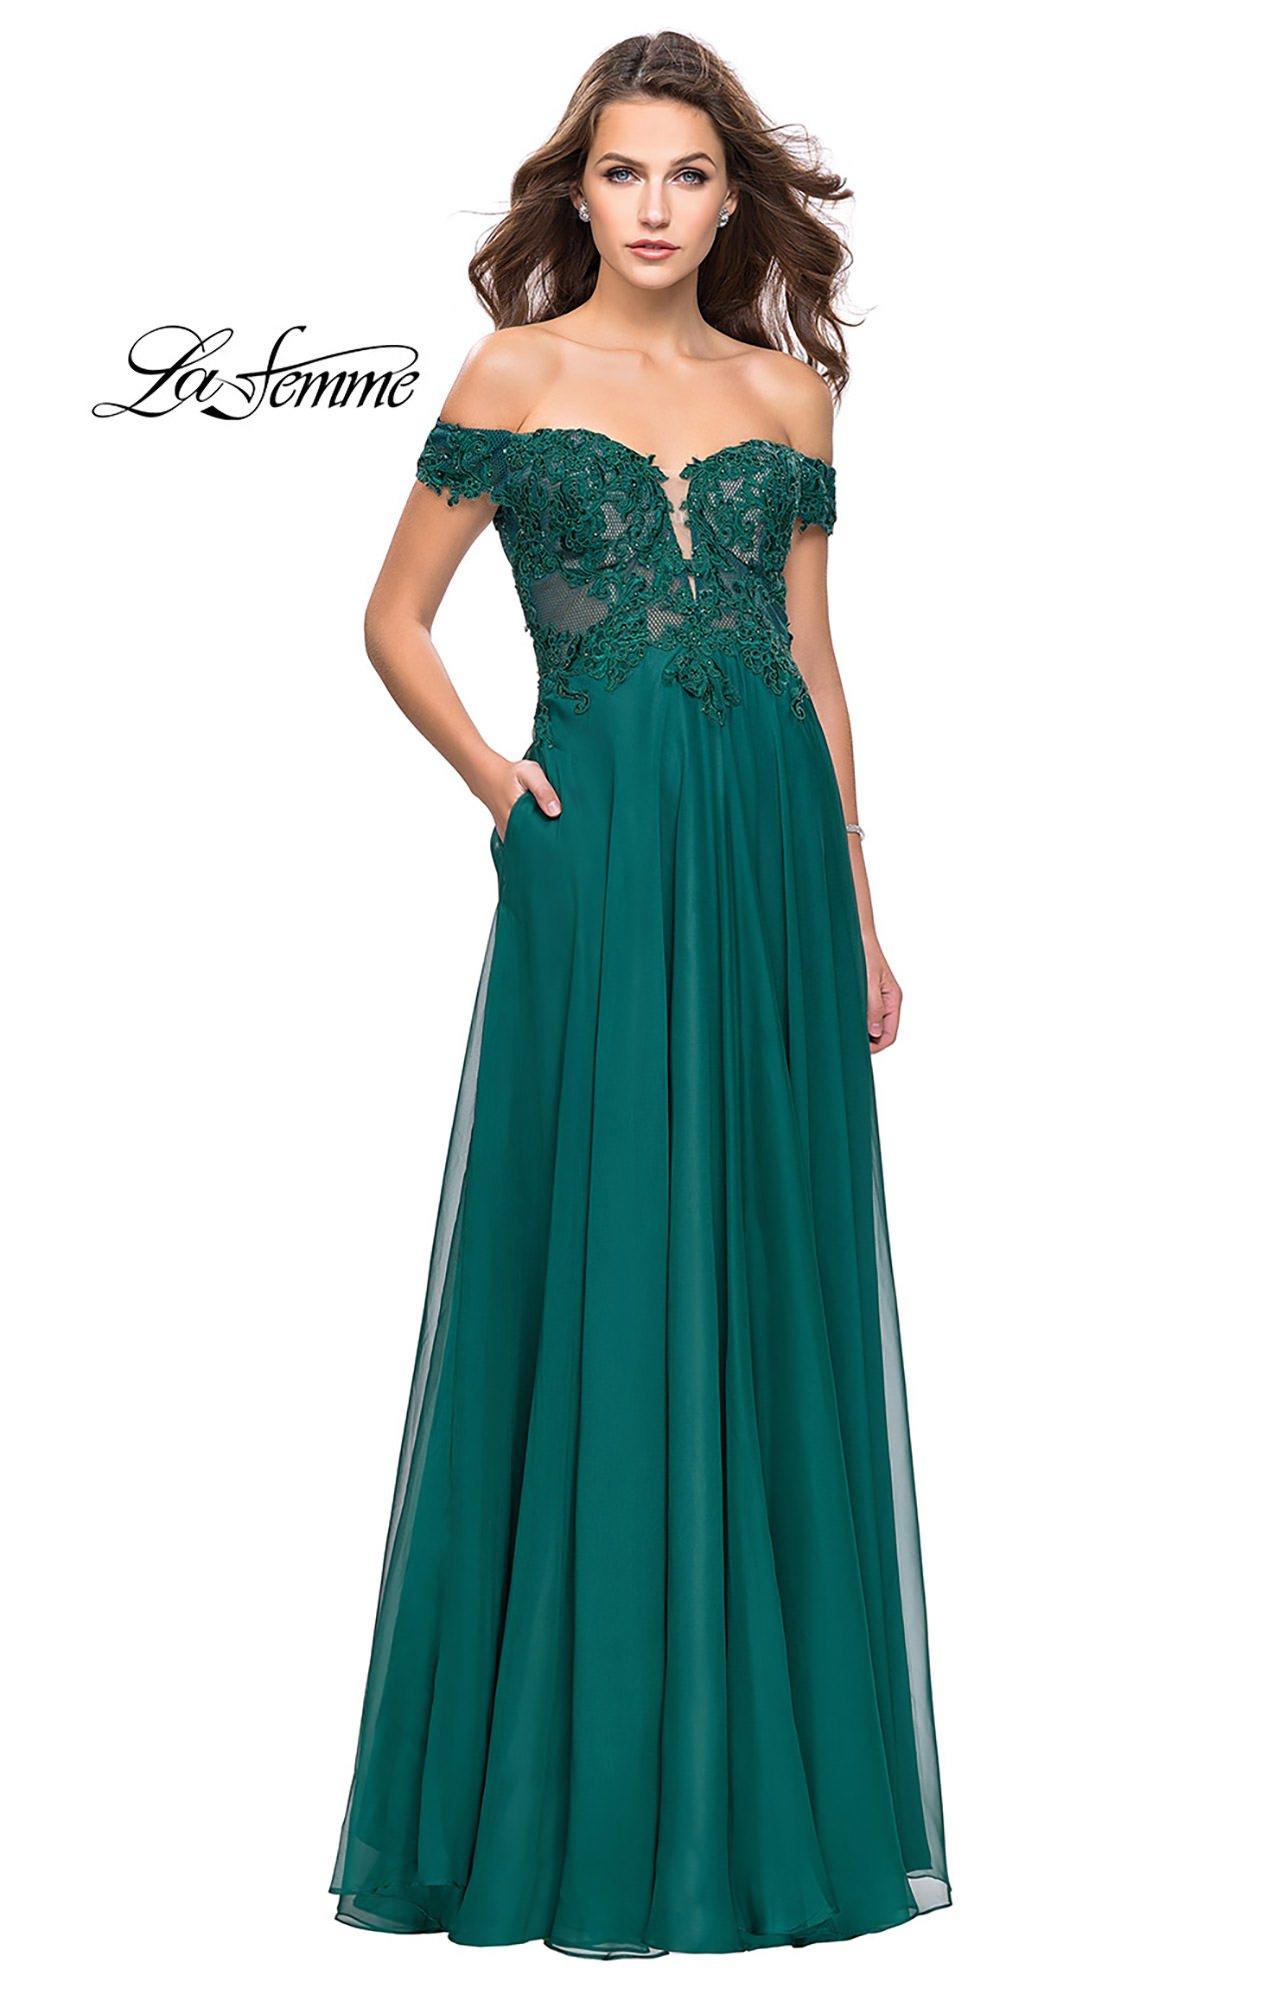 La Femme 25129 - Sweetheart Off the Shoulder Chiffon A-Line Prom Dress